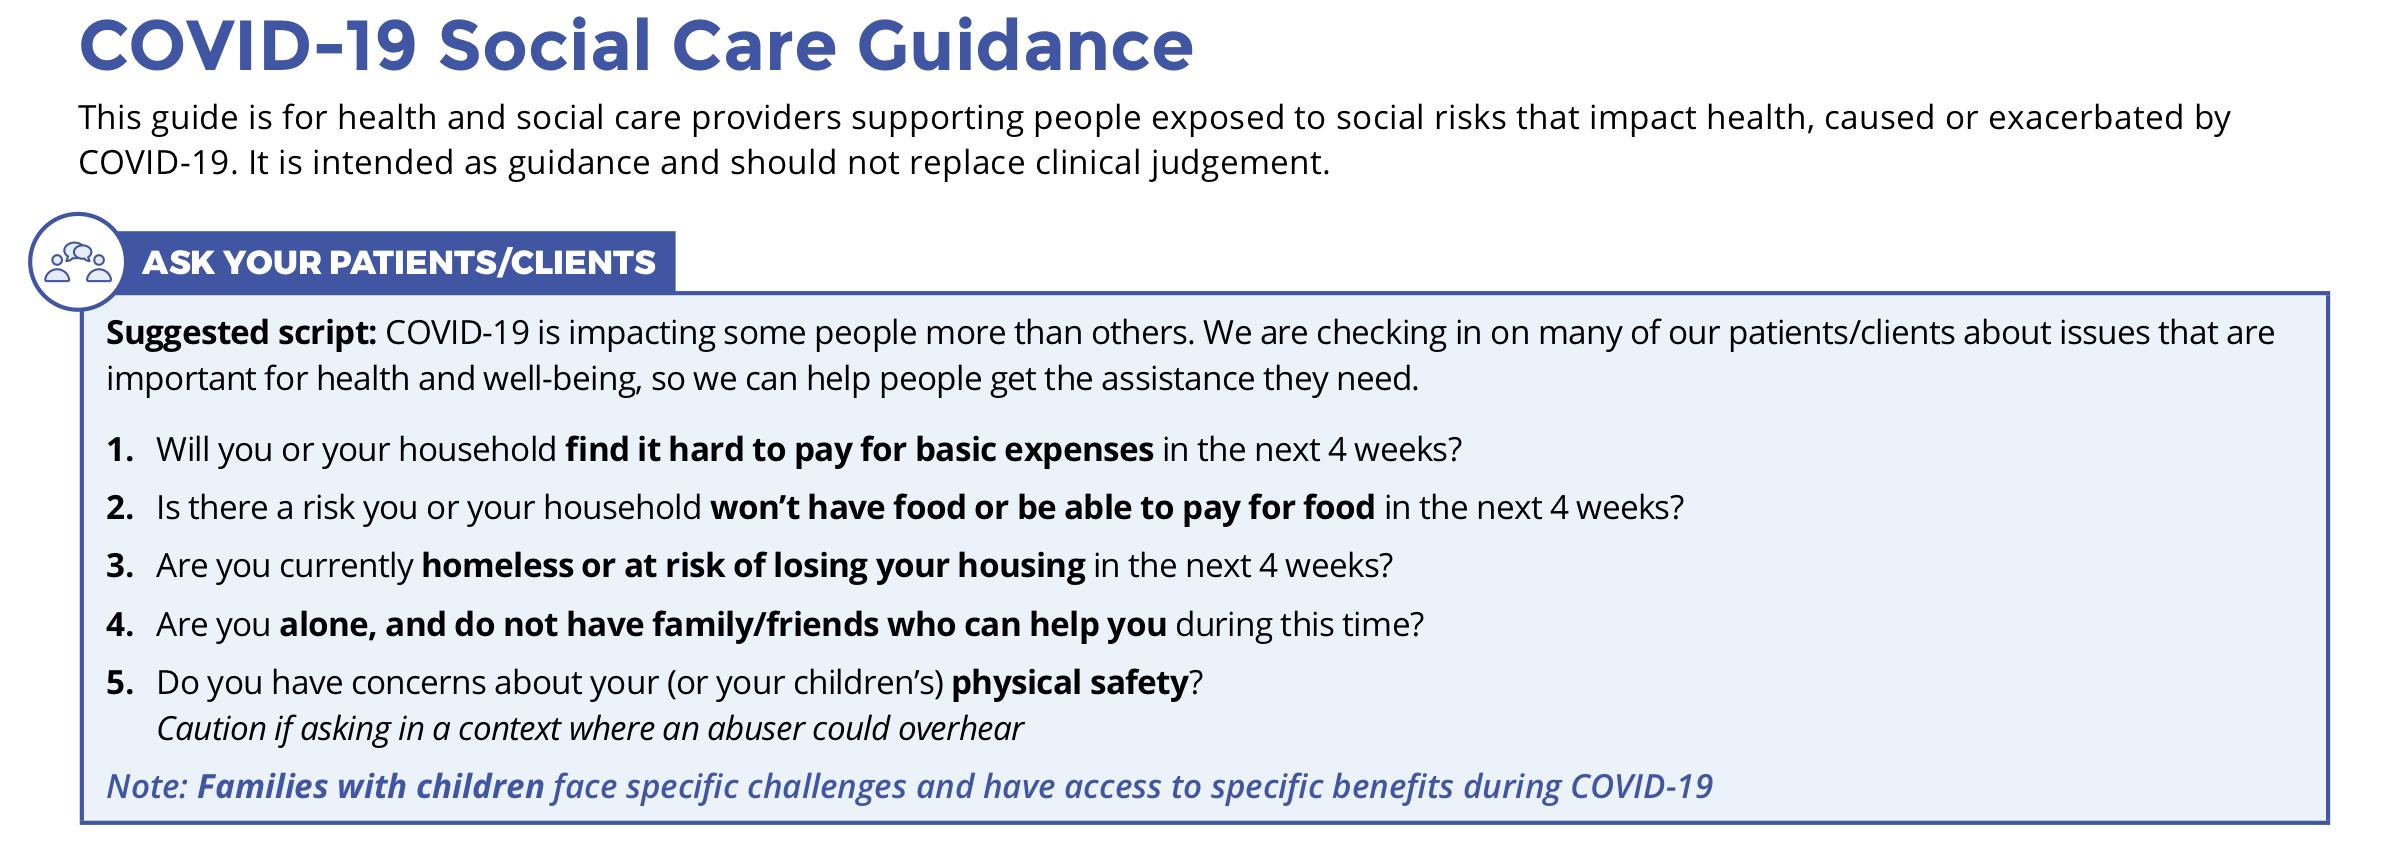 COVID-19 Social Care Guidance